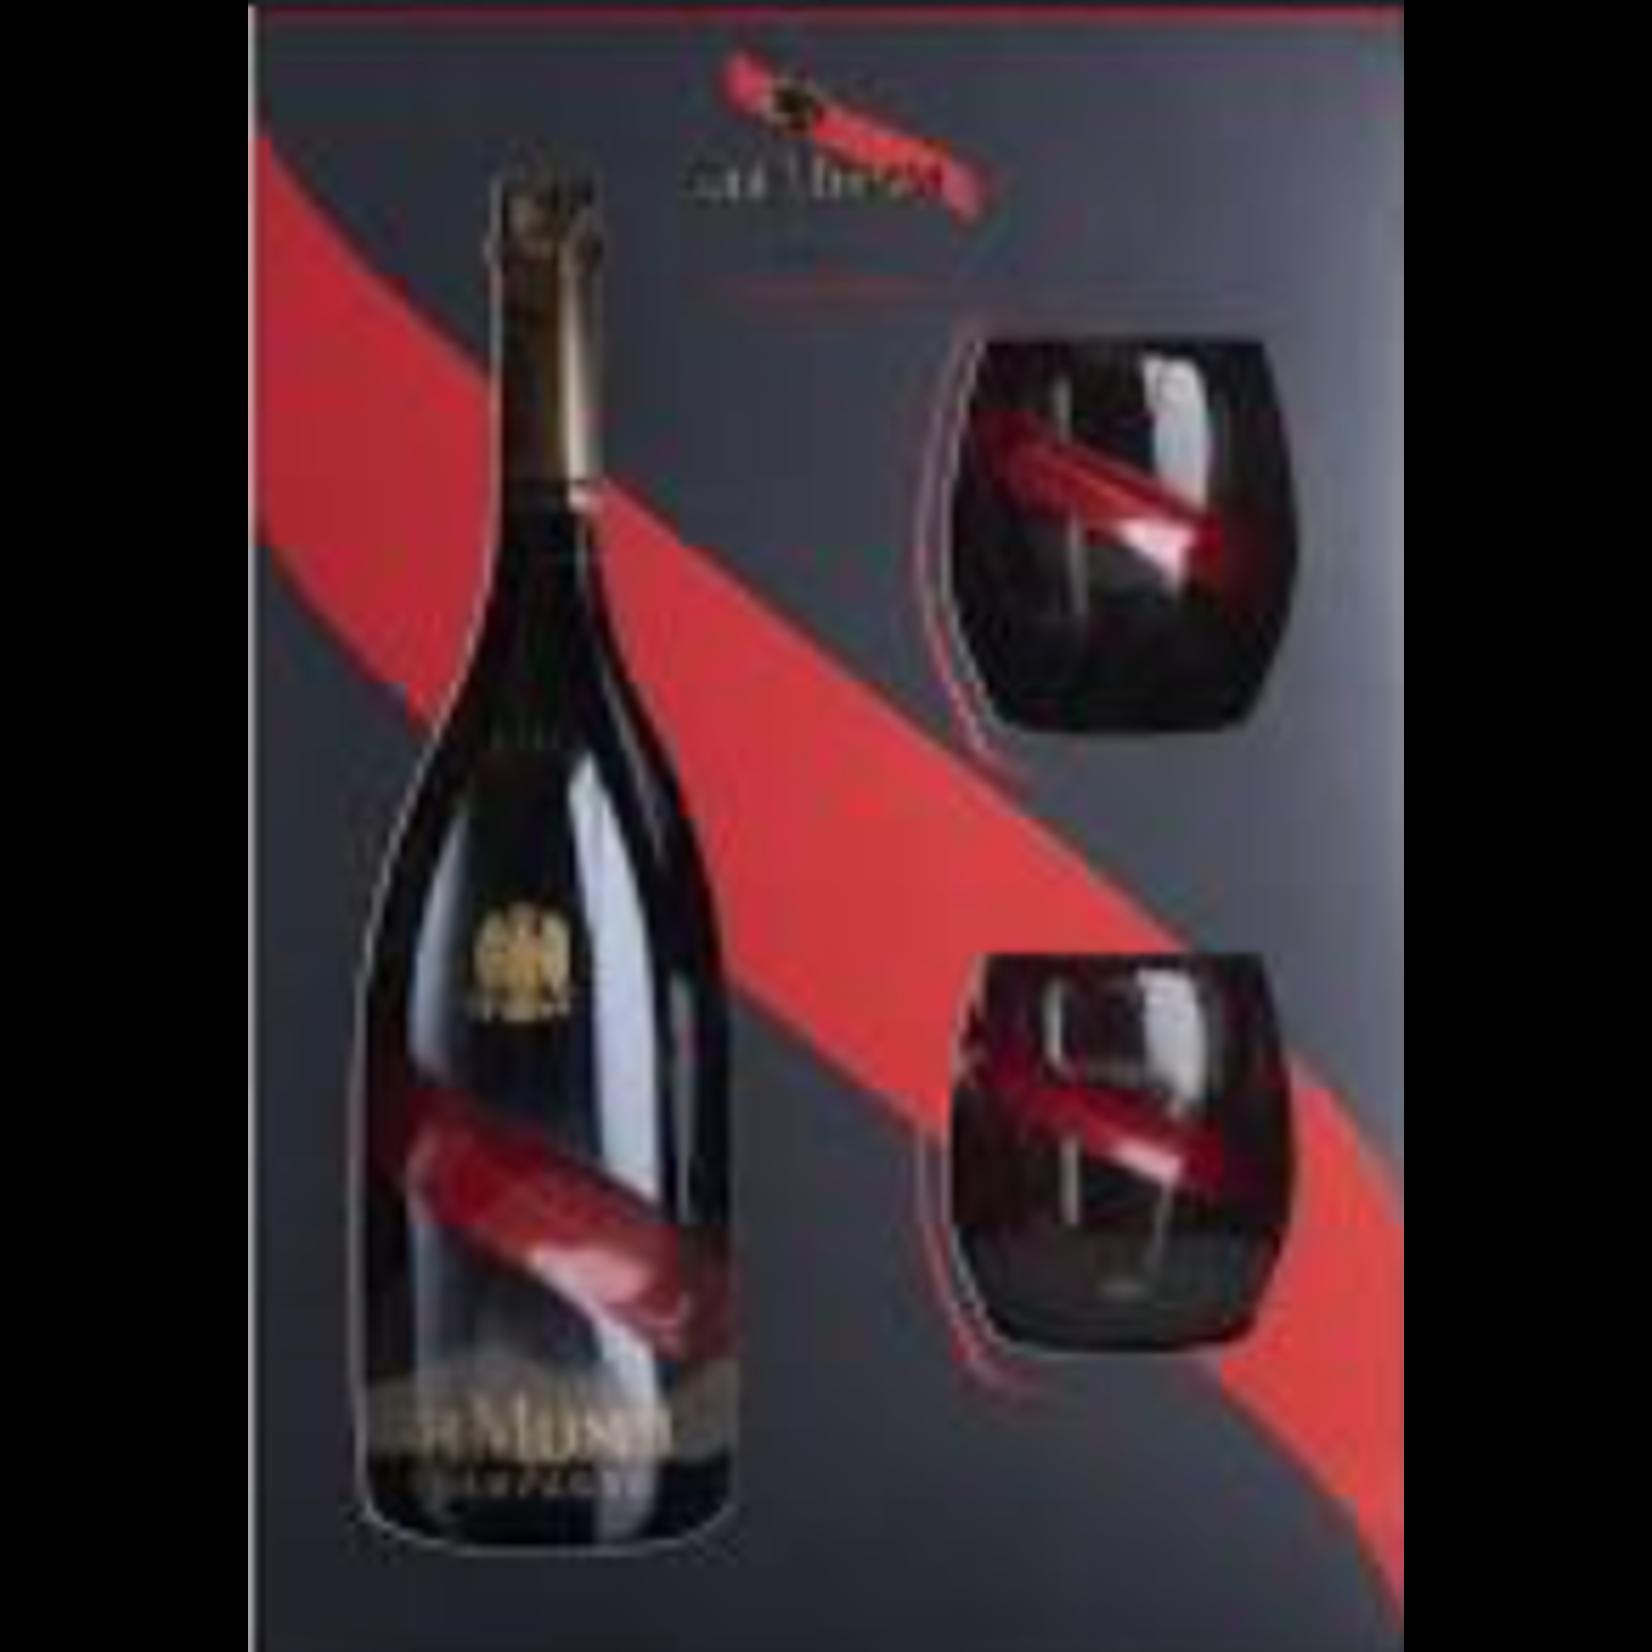 G. H. Mumm G.H. Mumm Grand Cordon Brut Champagne 2 Flute Gift Set Champagne, France 92pts-WS